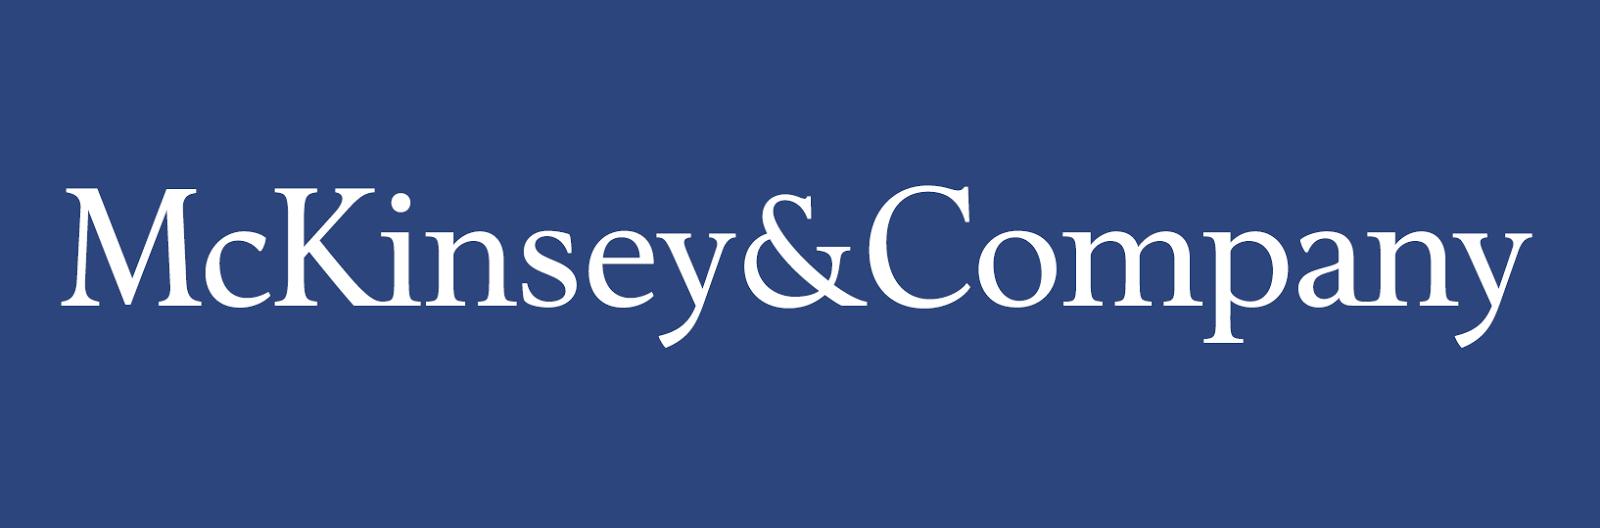 Logo of McKinsey & Company